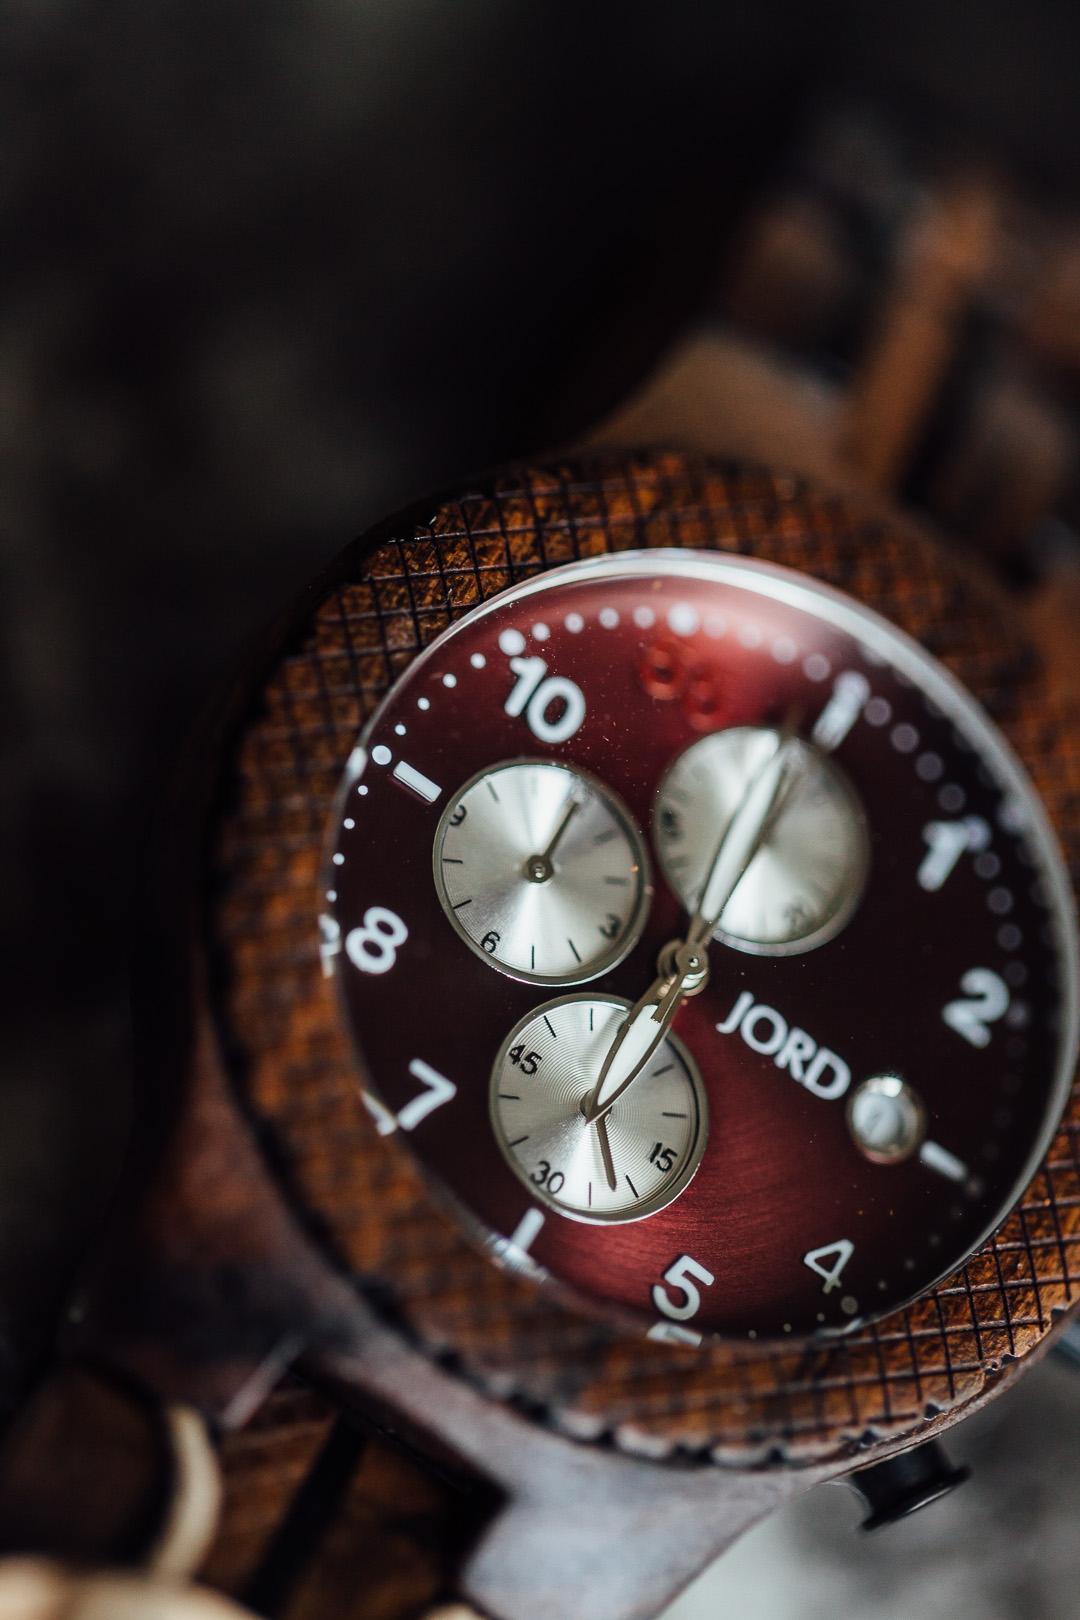 Christmas Gift Idea: Jord Wood Watch